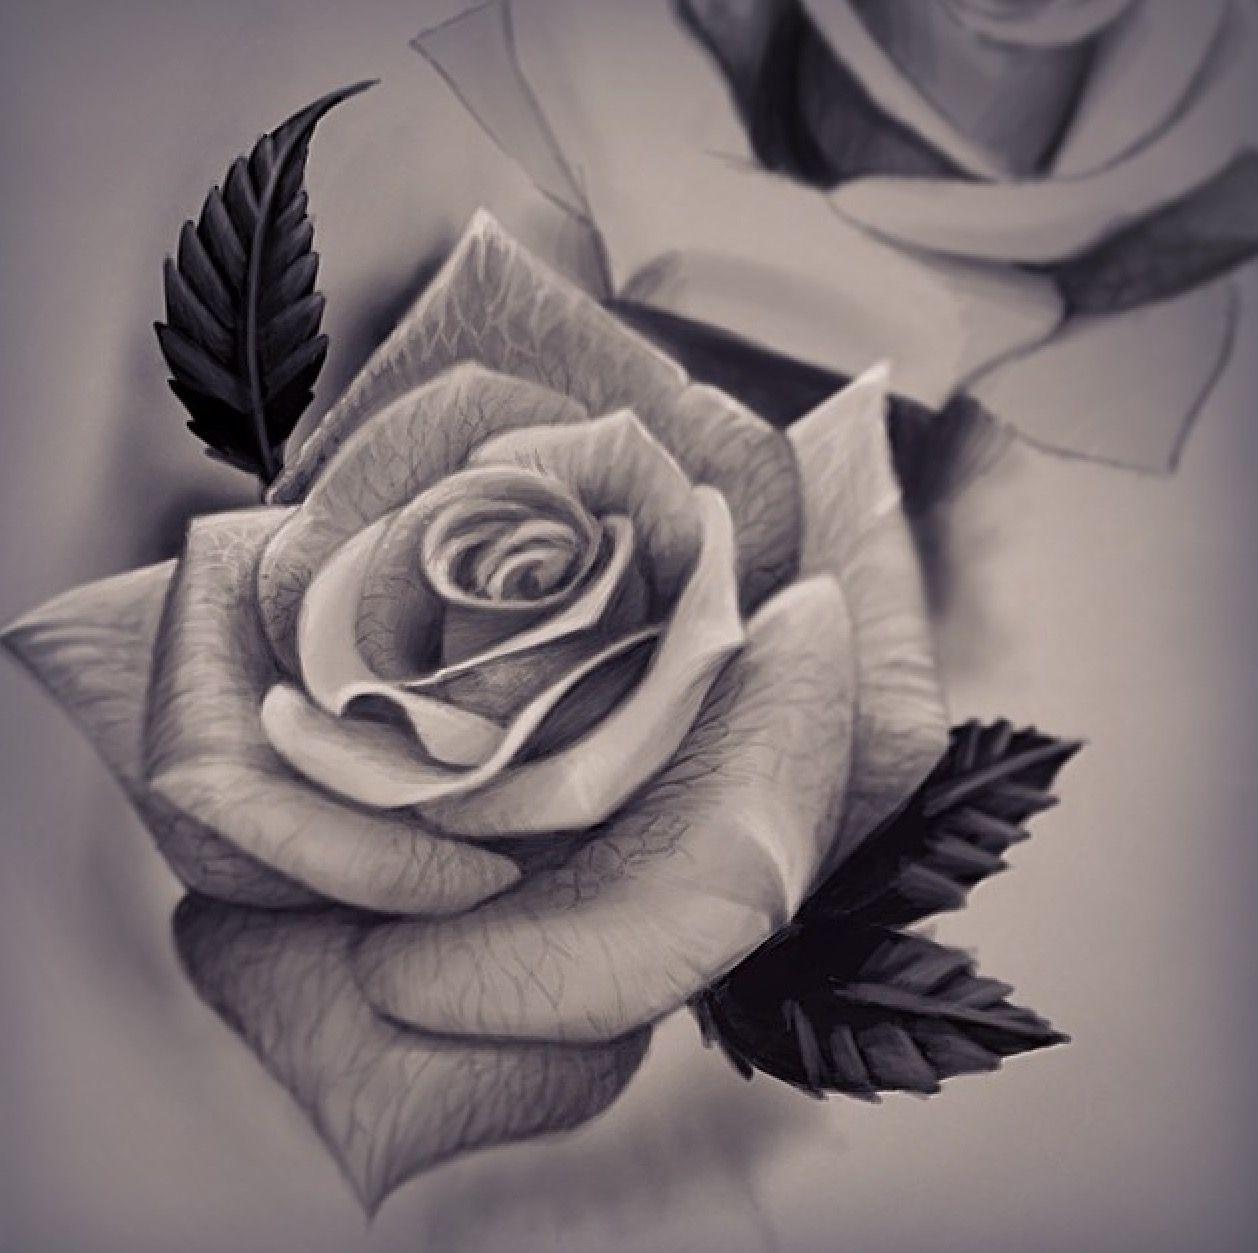 Pin by Vives Virgen Santa on flowers | Pinterest | Tattoo